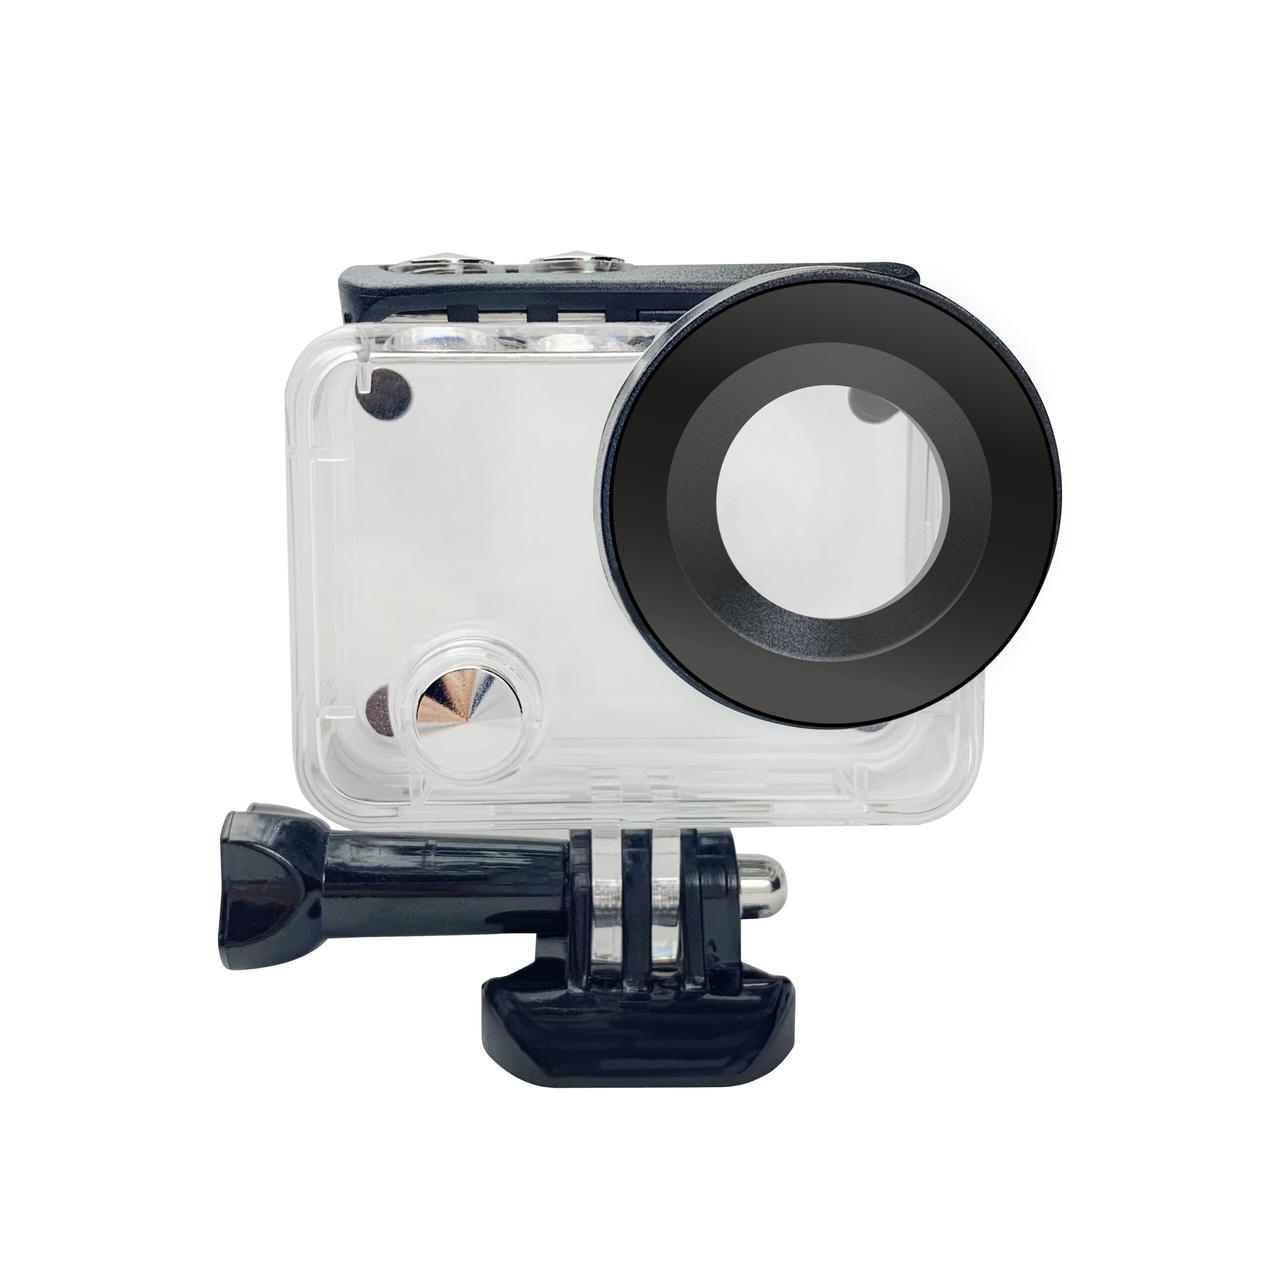 Аквабокс для екшн-камер AIRON ProCam 7, ProCam 8 / на складі